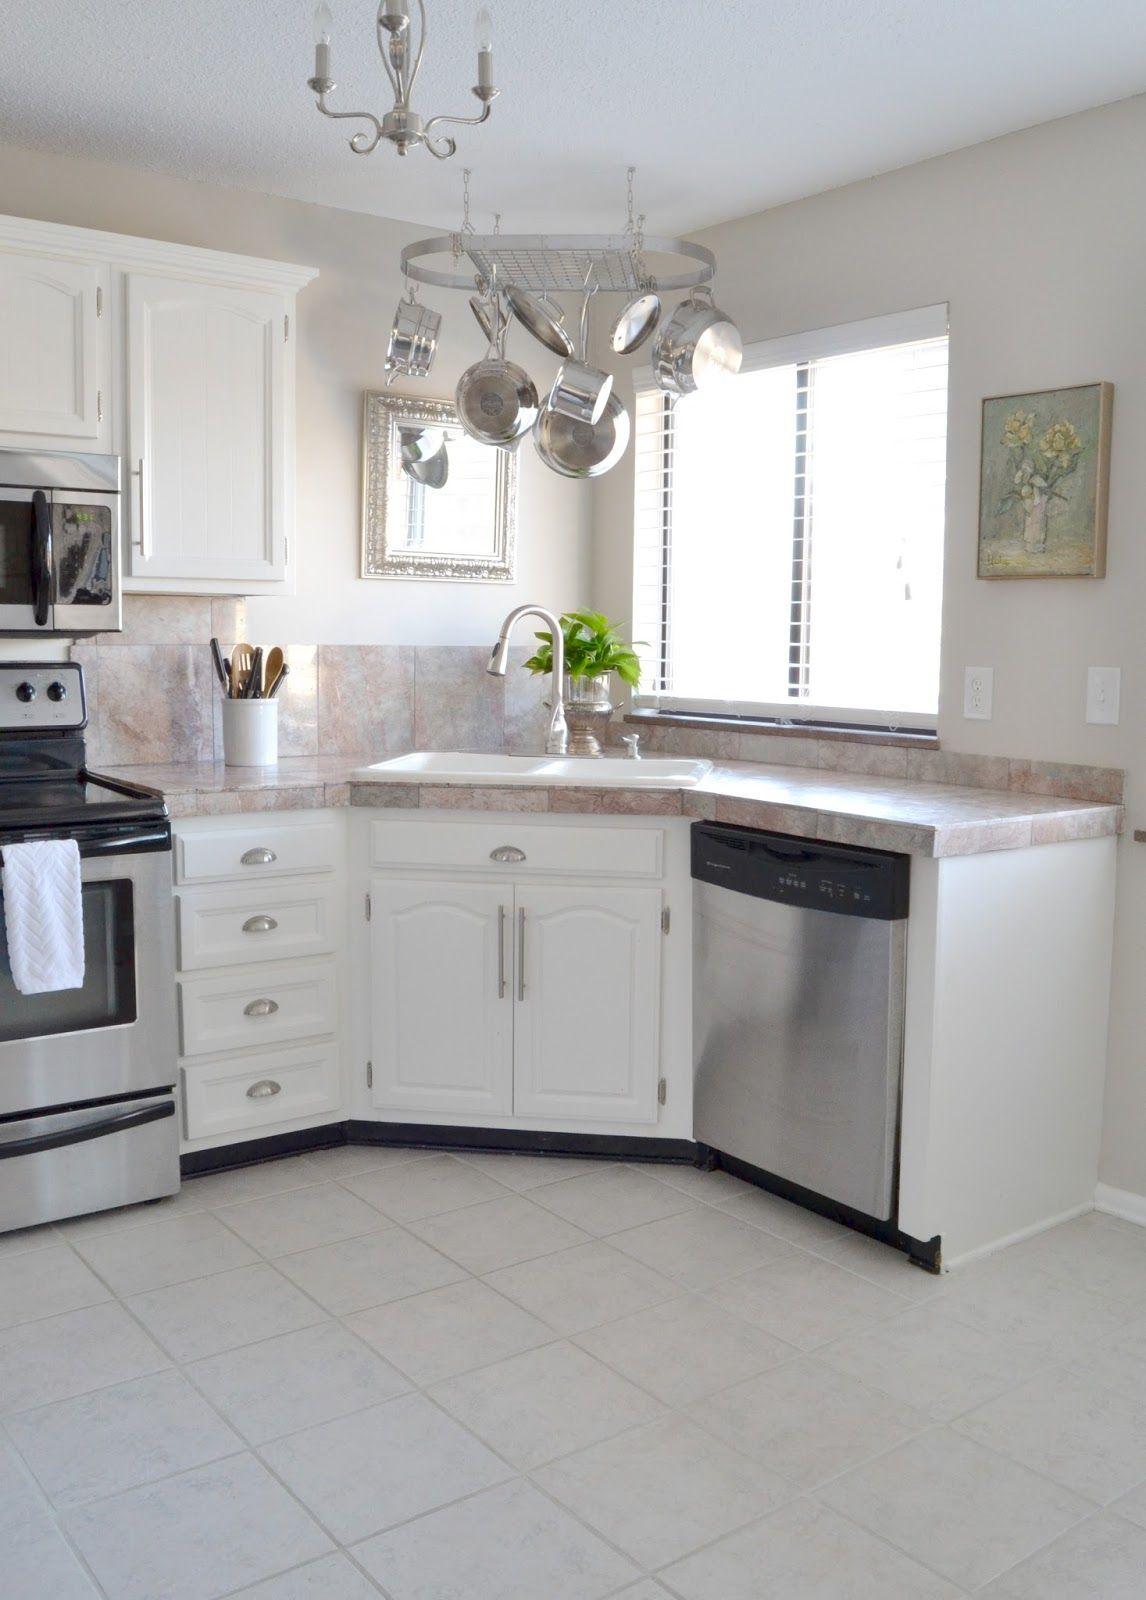 Livelovediy 10 Thrift Store Shopping Secrets You Should Know Small Kitchen Plans Kitchen Design Small Corner Sink Kitchen